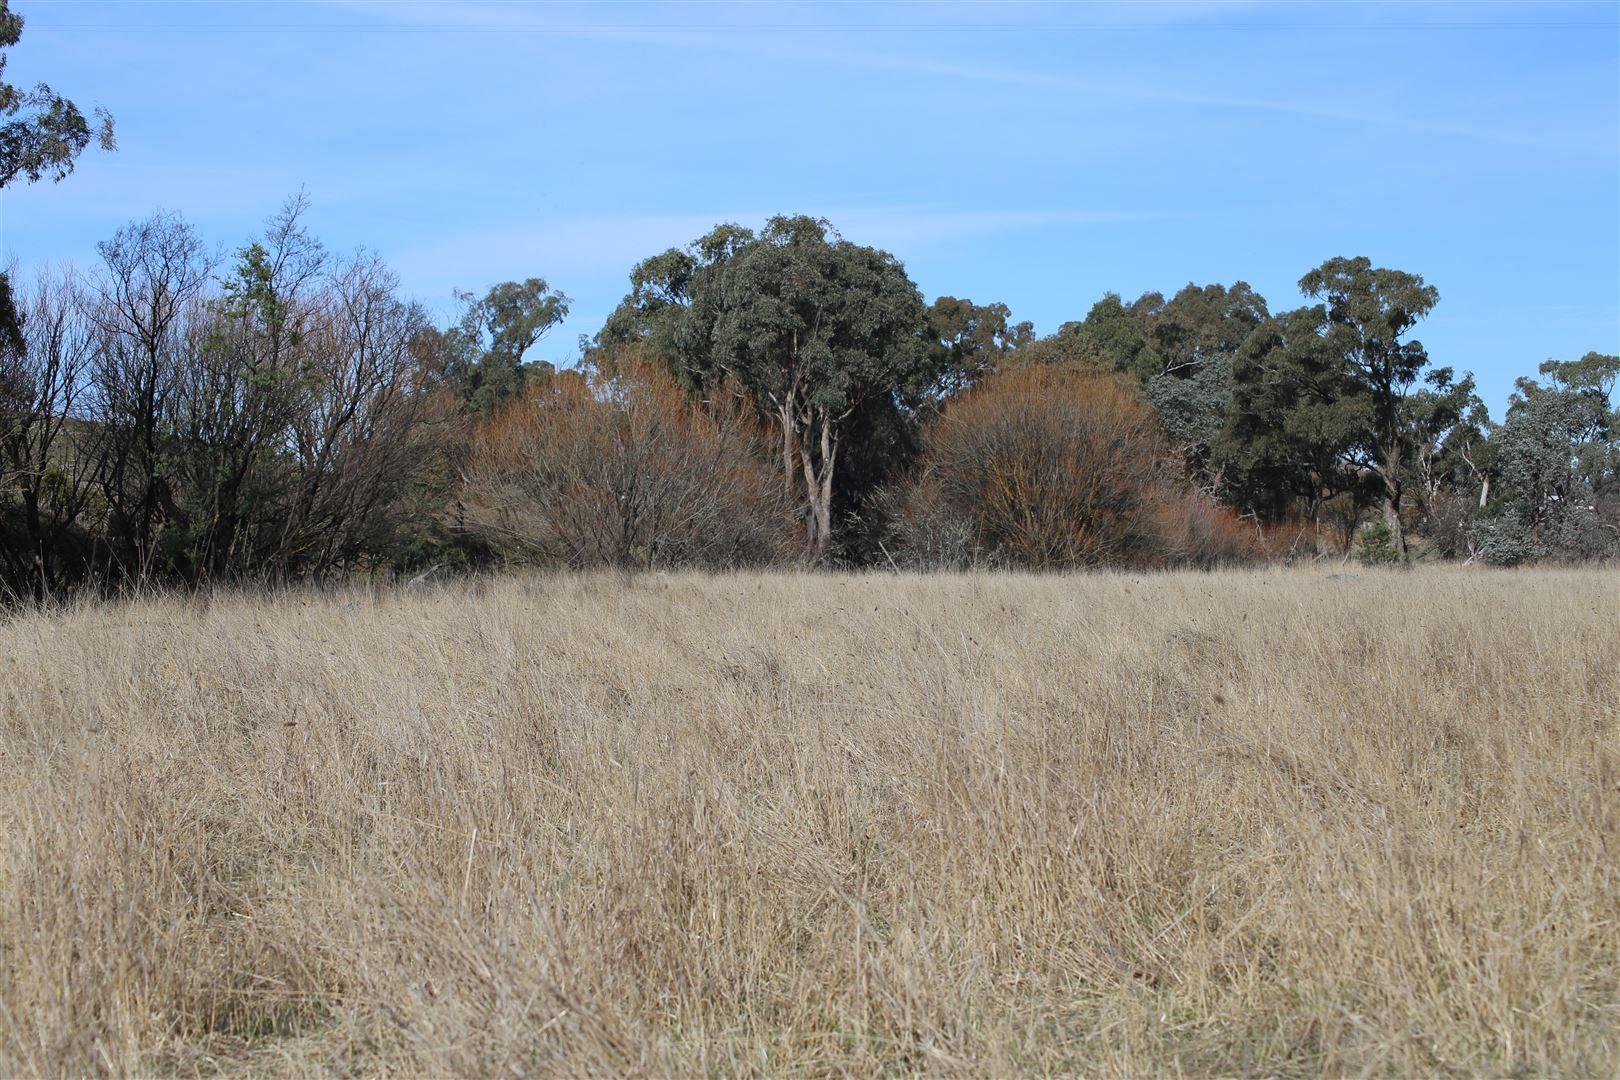 lot 163 Flacknell Creek Road, Gunning NSW 2581, Image 0